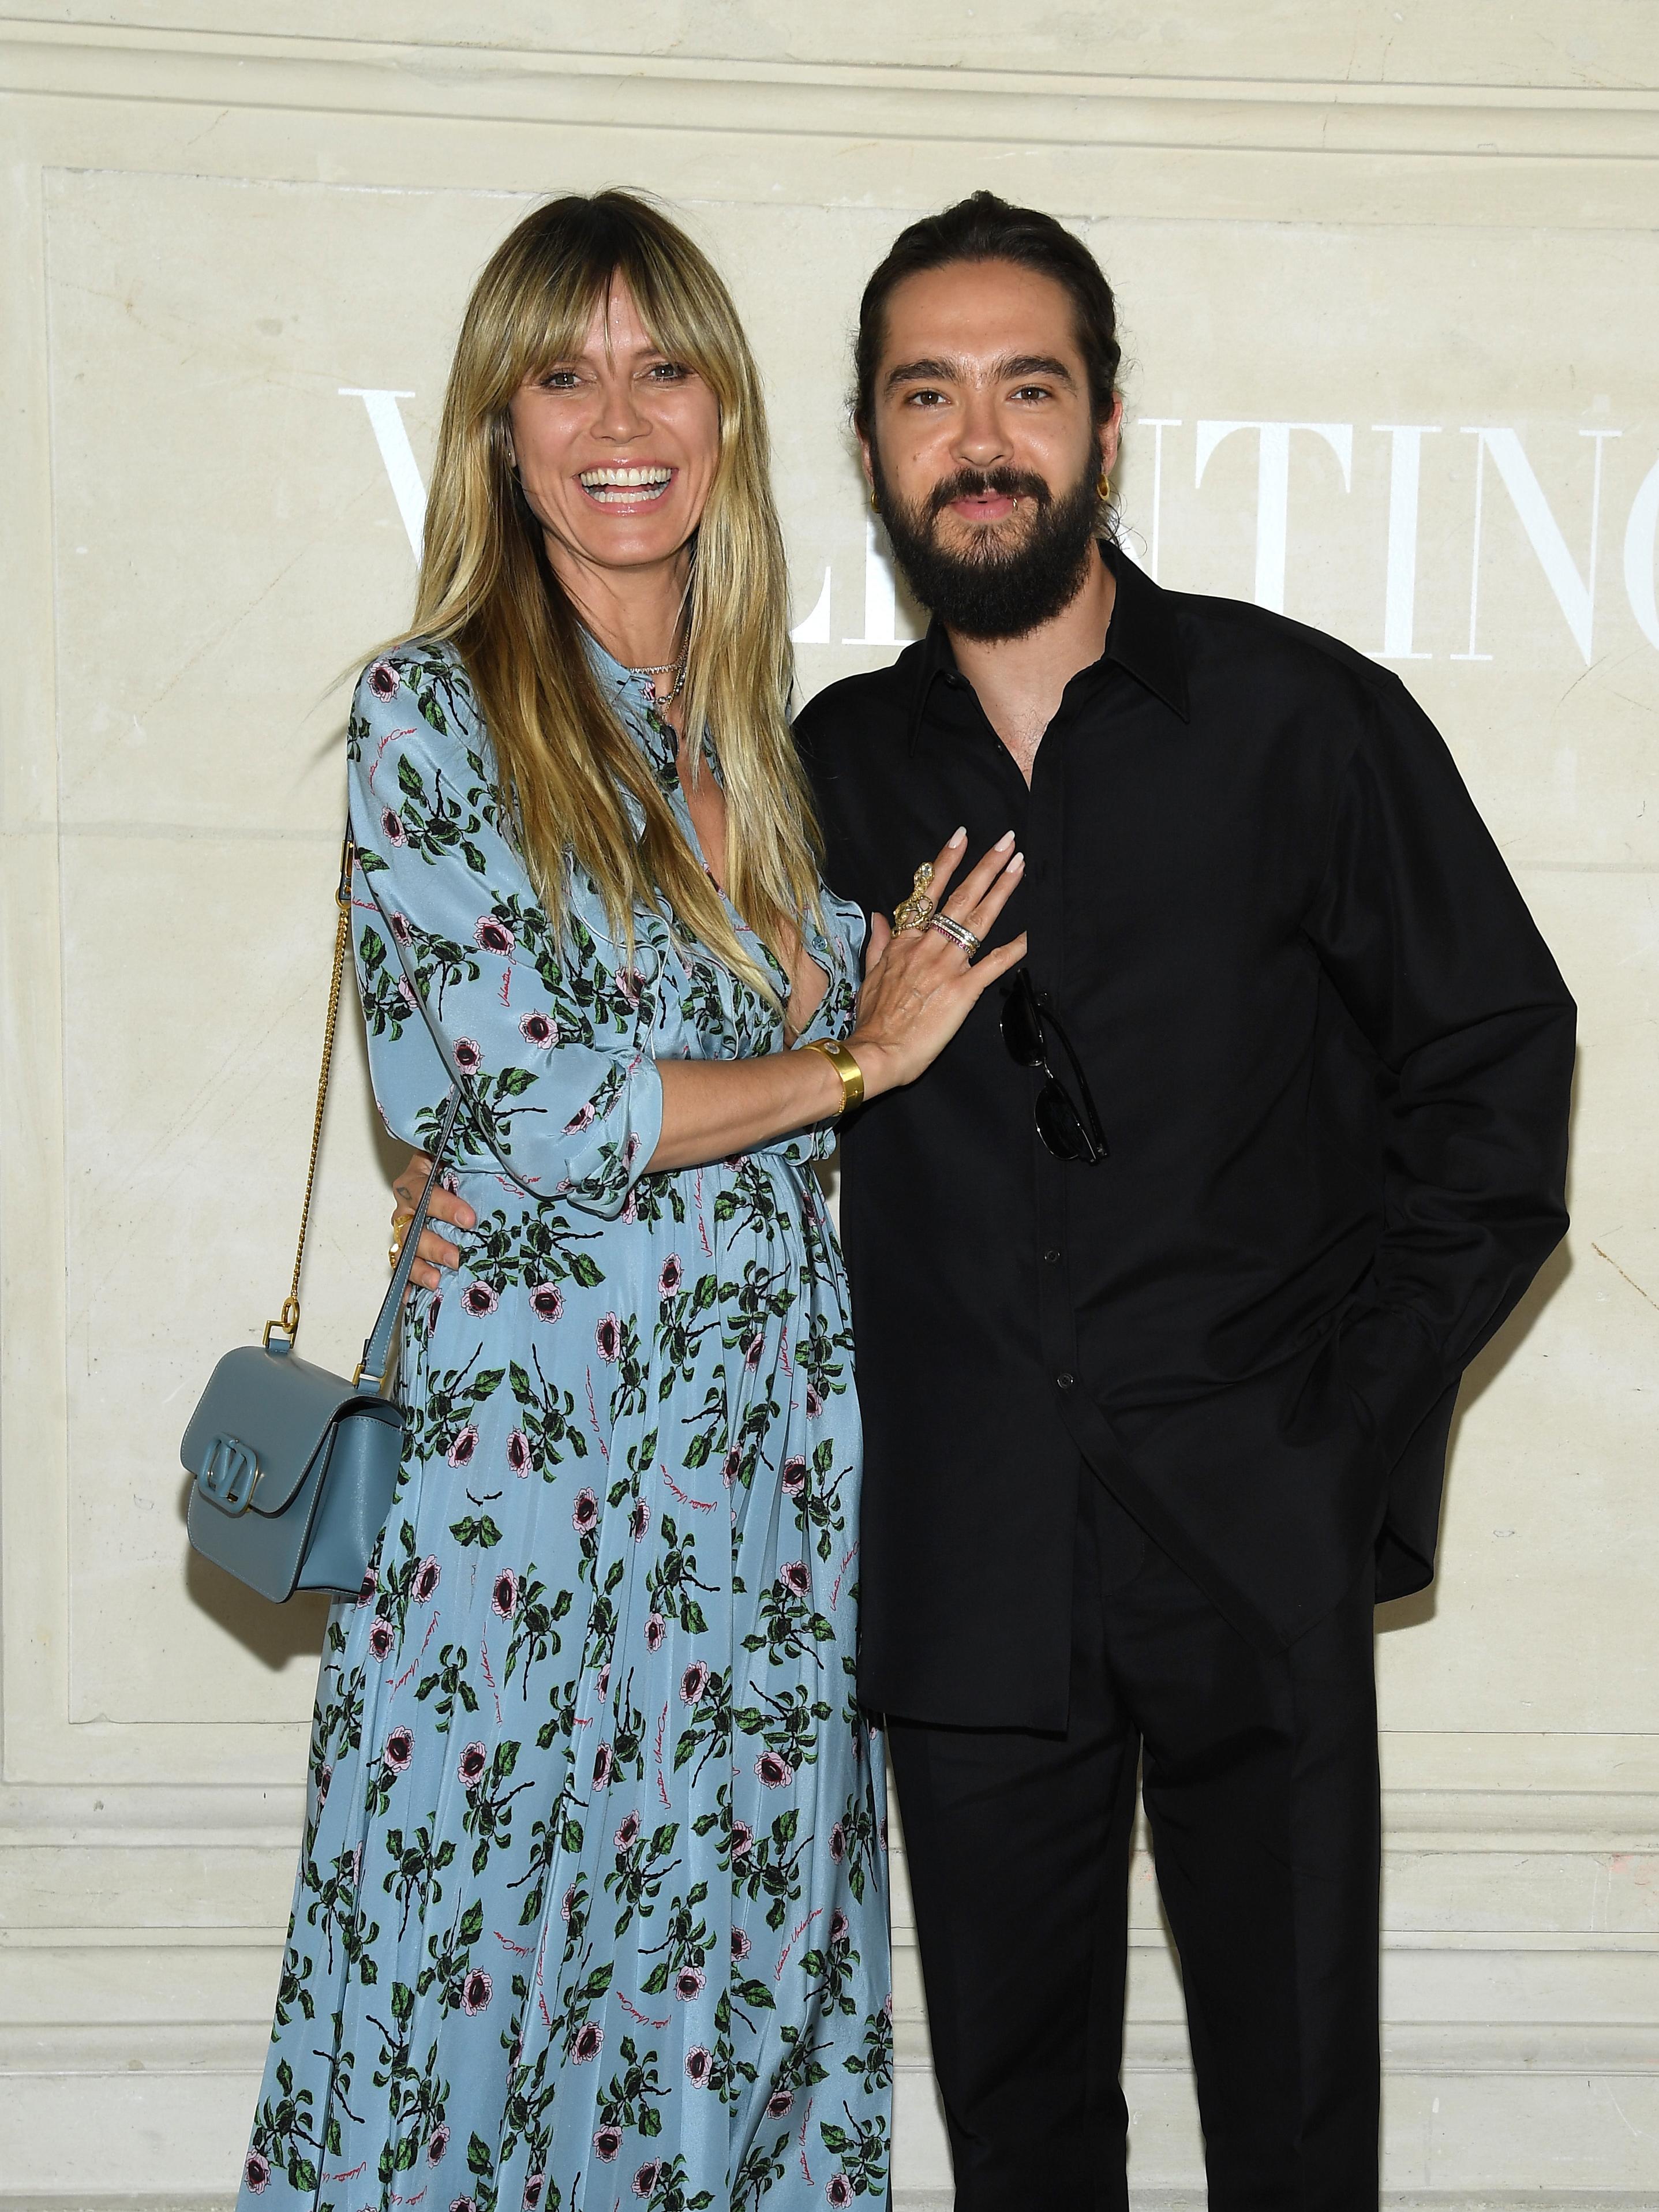 Heidi Klum has been secretly married to Tom Kaulitz for MONTHS 3